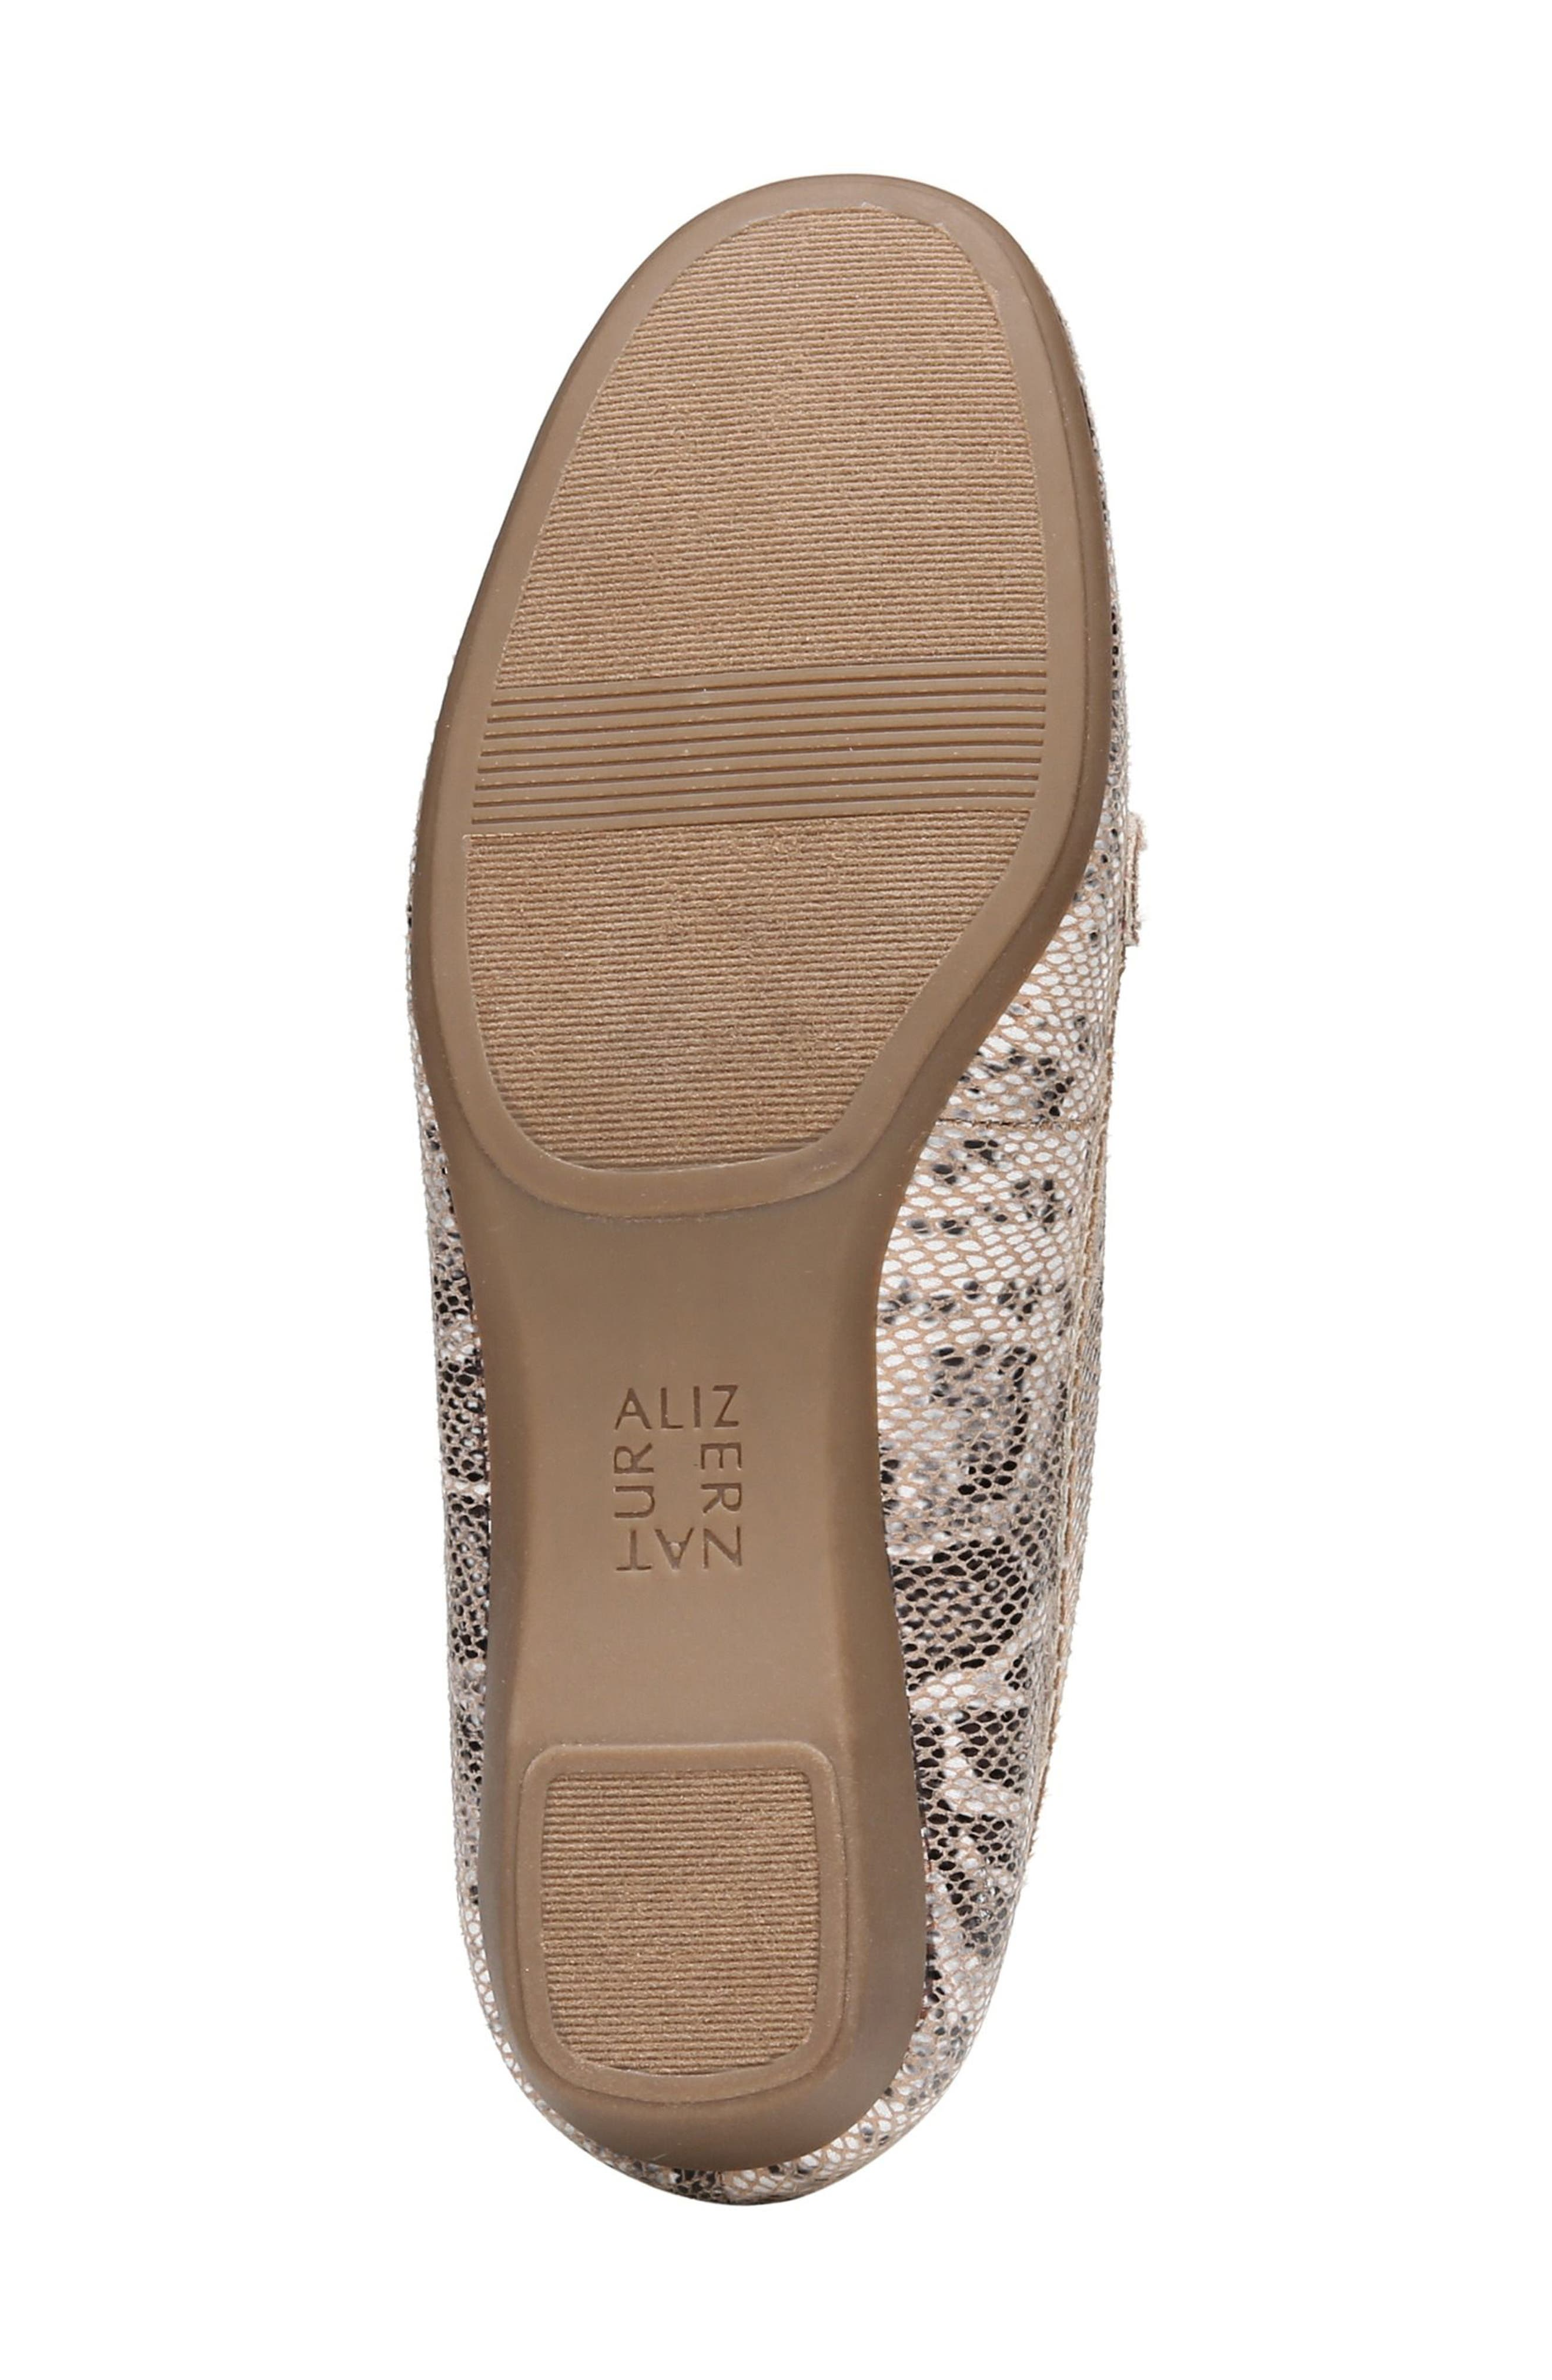 'Gisella' Loafer,                             Alternate thumbnail 6, color,                             Mauve Print Fabric